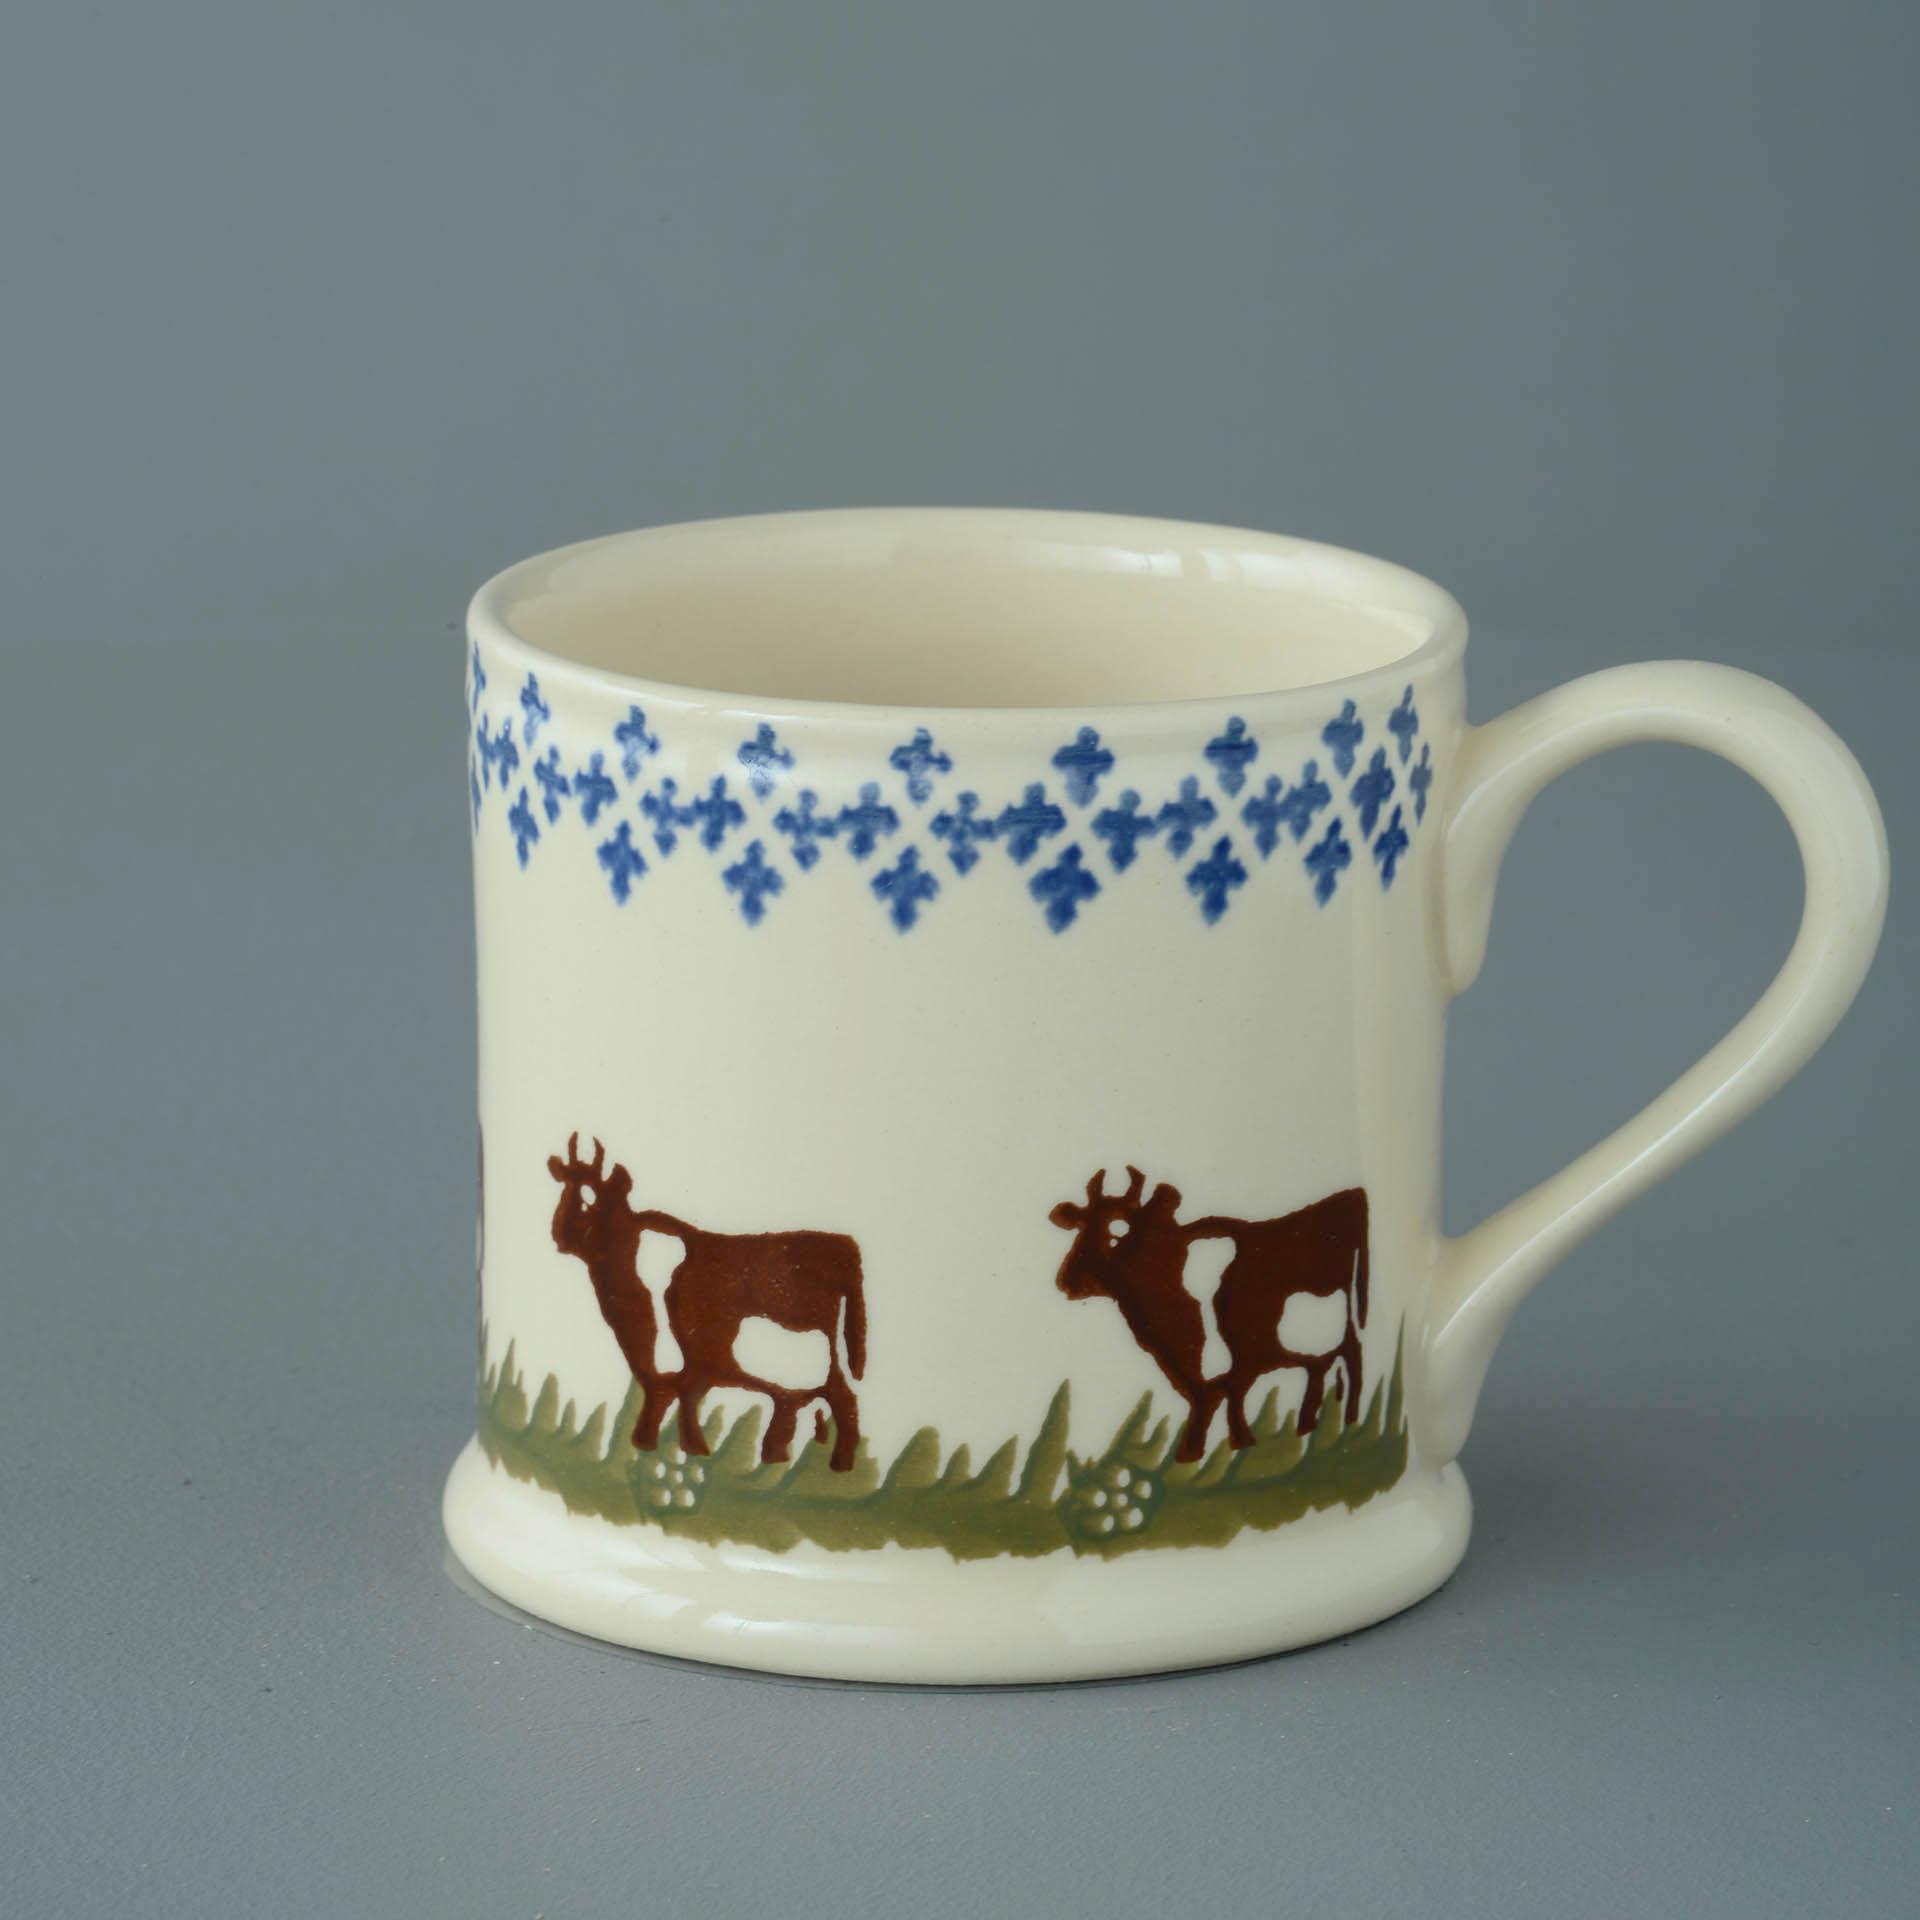 Cows 250ml Large Mug 8 x 8.4cm